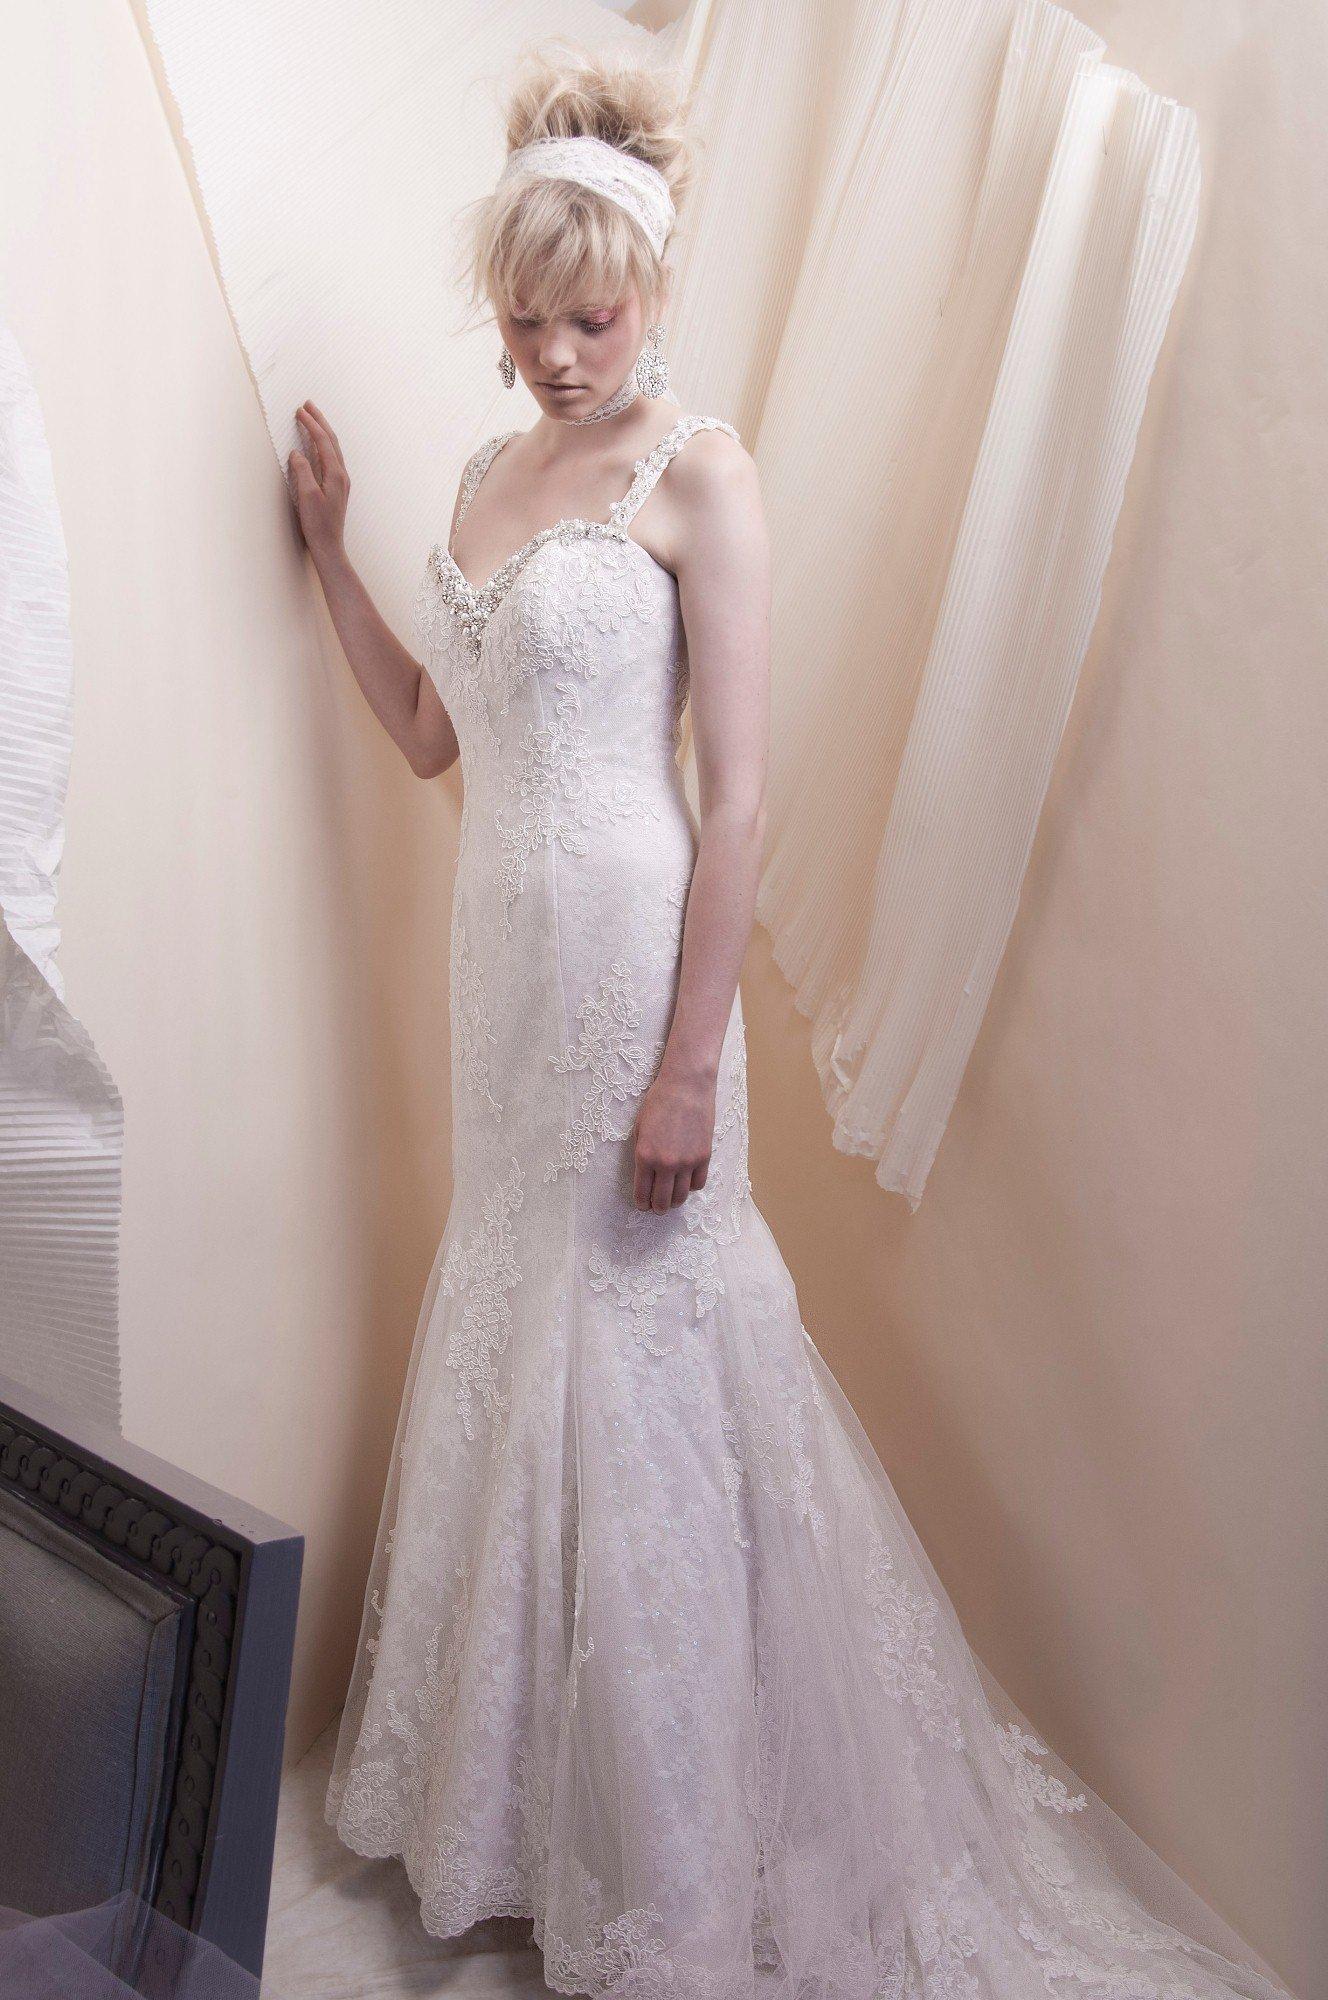 dress alfred sung spring 2013 bridal 6915 lace tulle alfredsung bridal. Black Bedroom Furniture Sets. Home Design Ideas